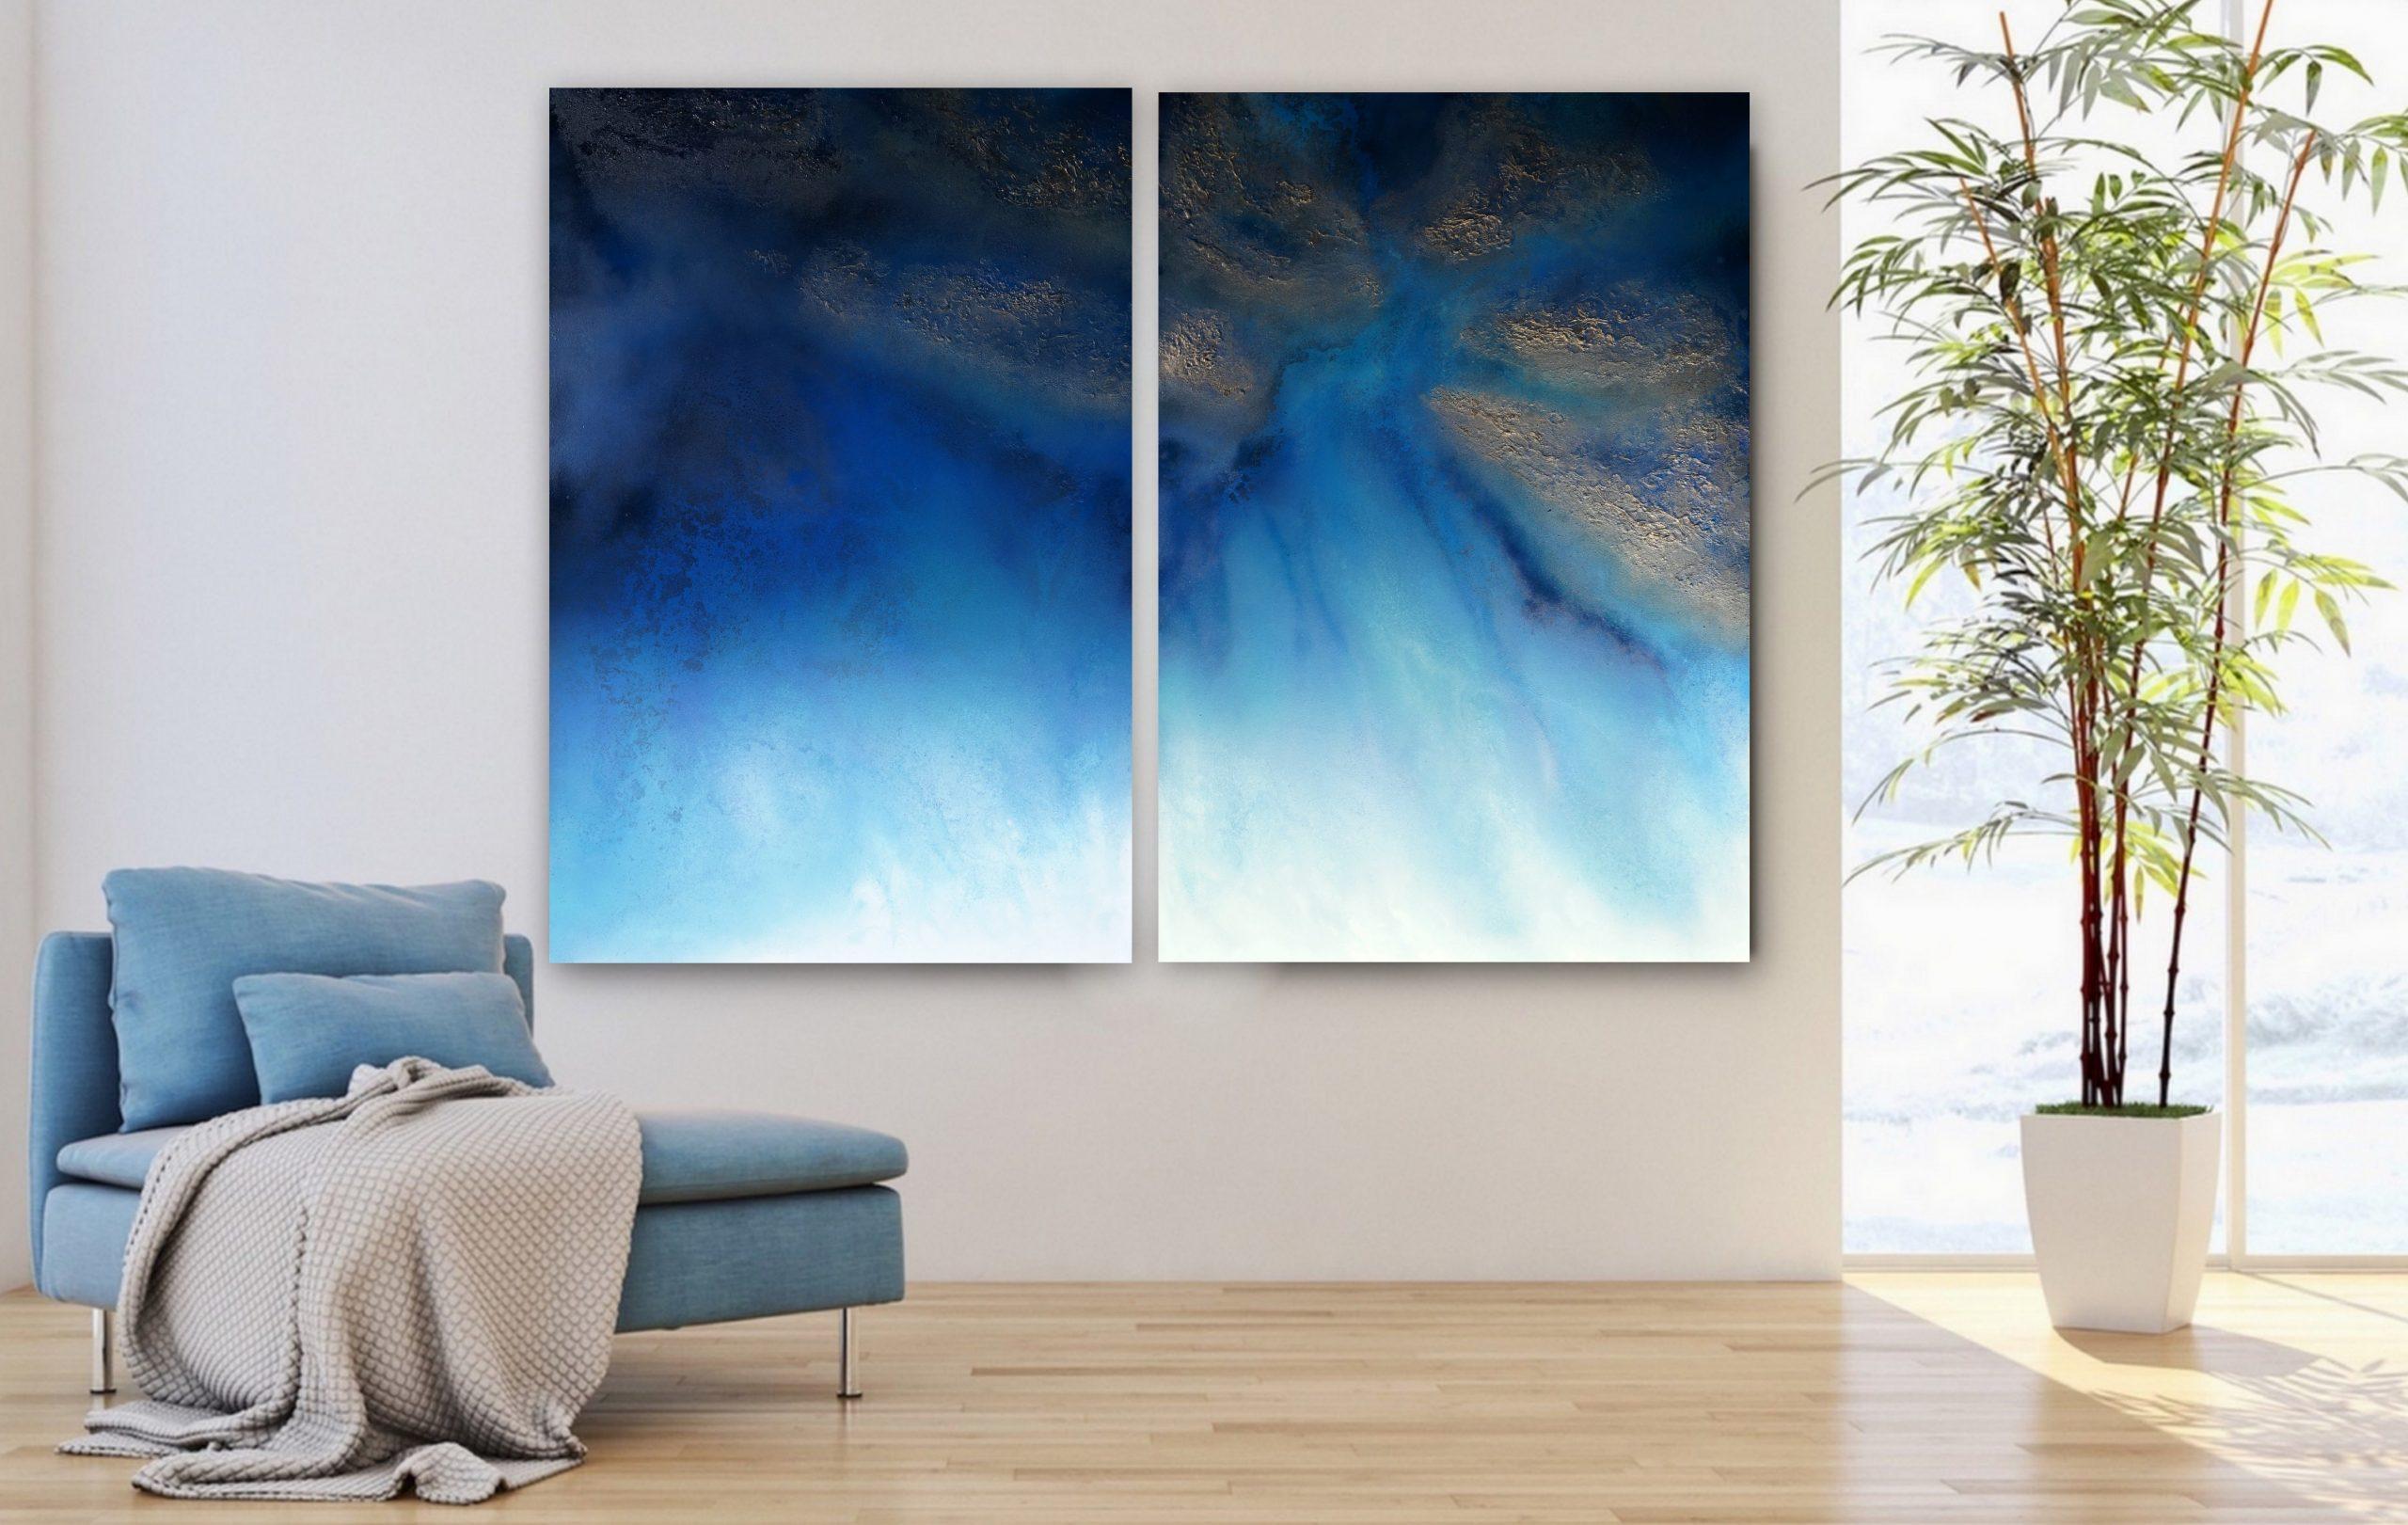 Blue Wall Art For Sale By Petra Meikle De Vlas1